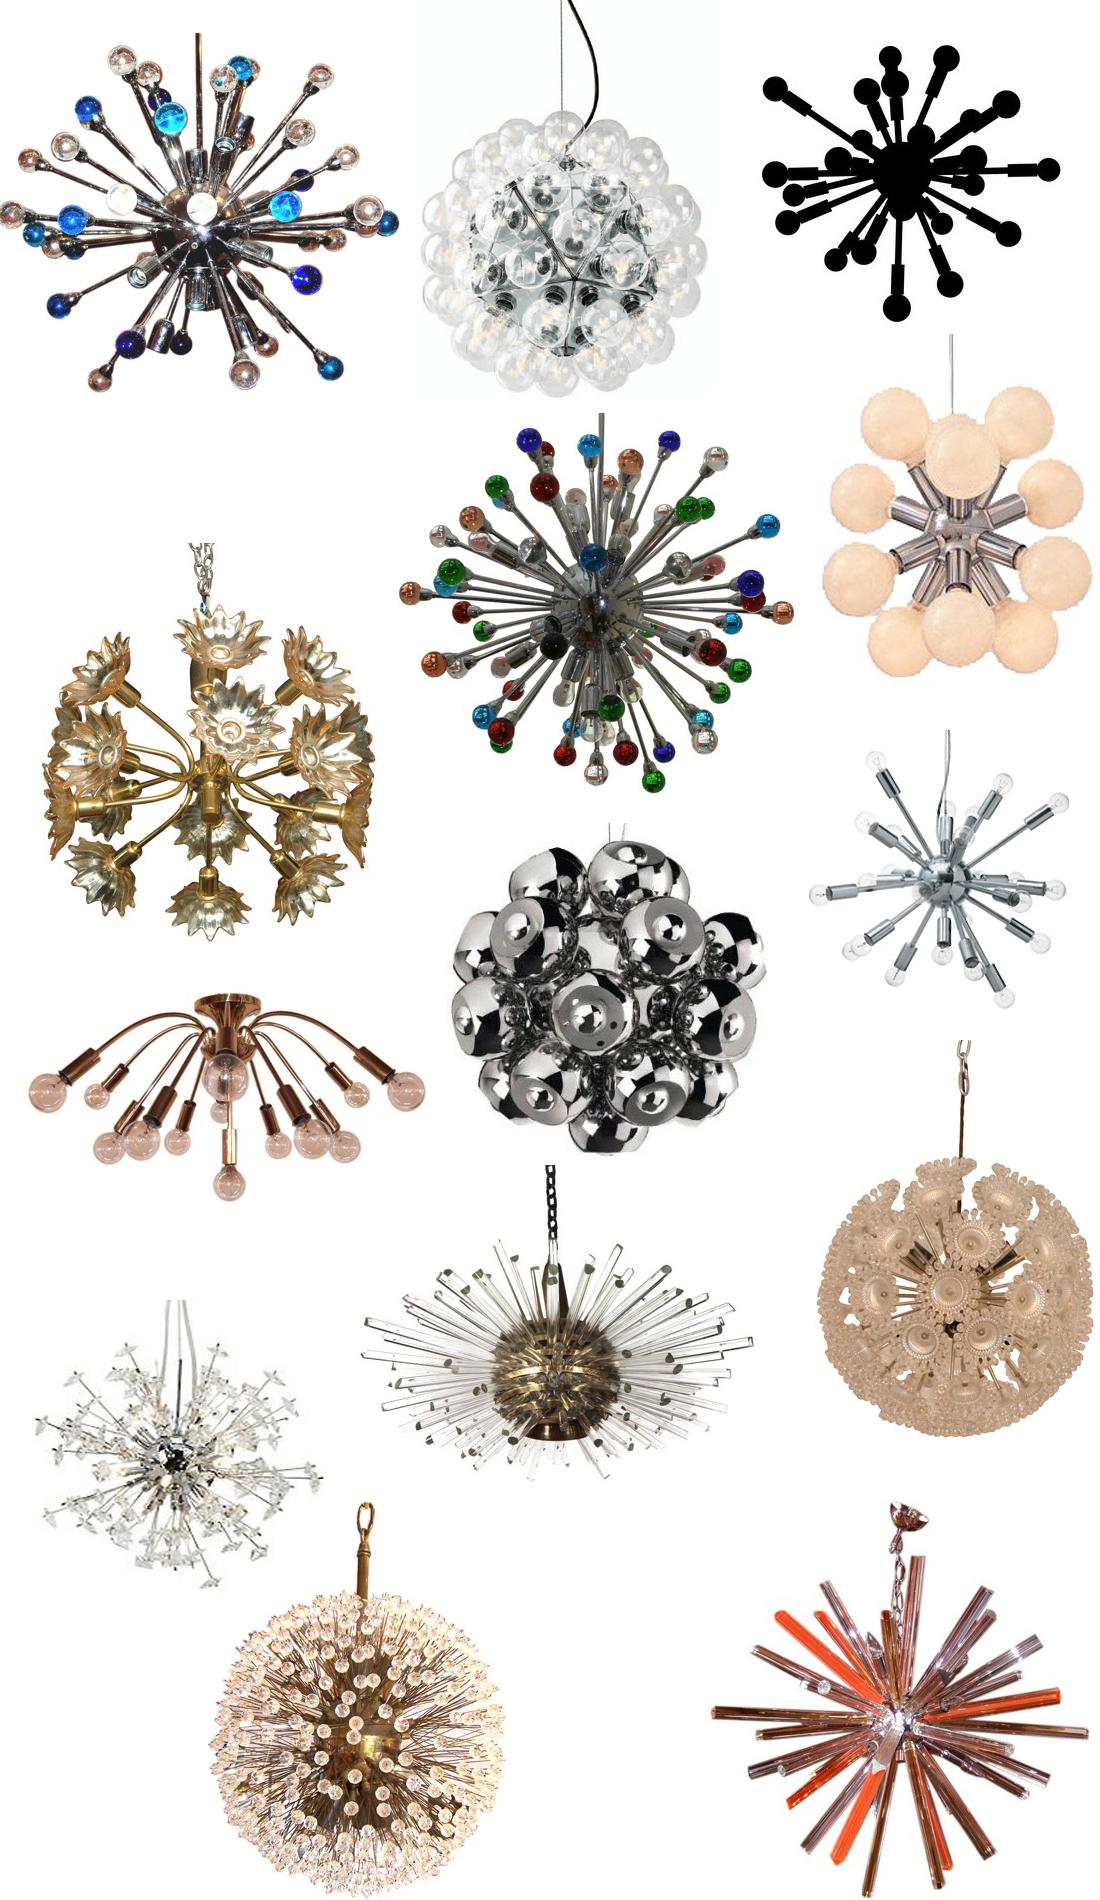 Sputnik christmas ornaments - Get The Look Sputnik Chandeliers